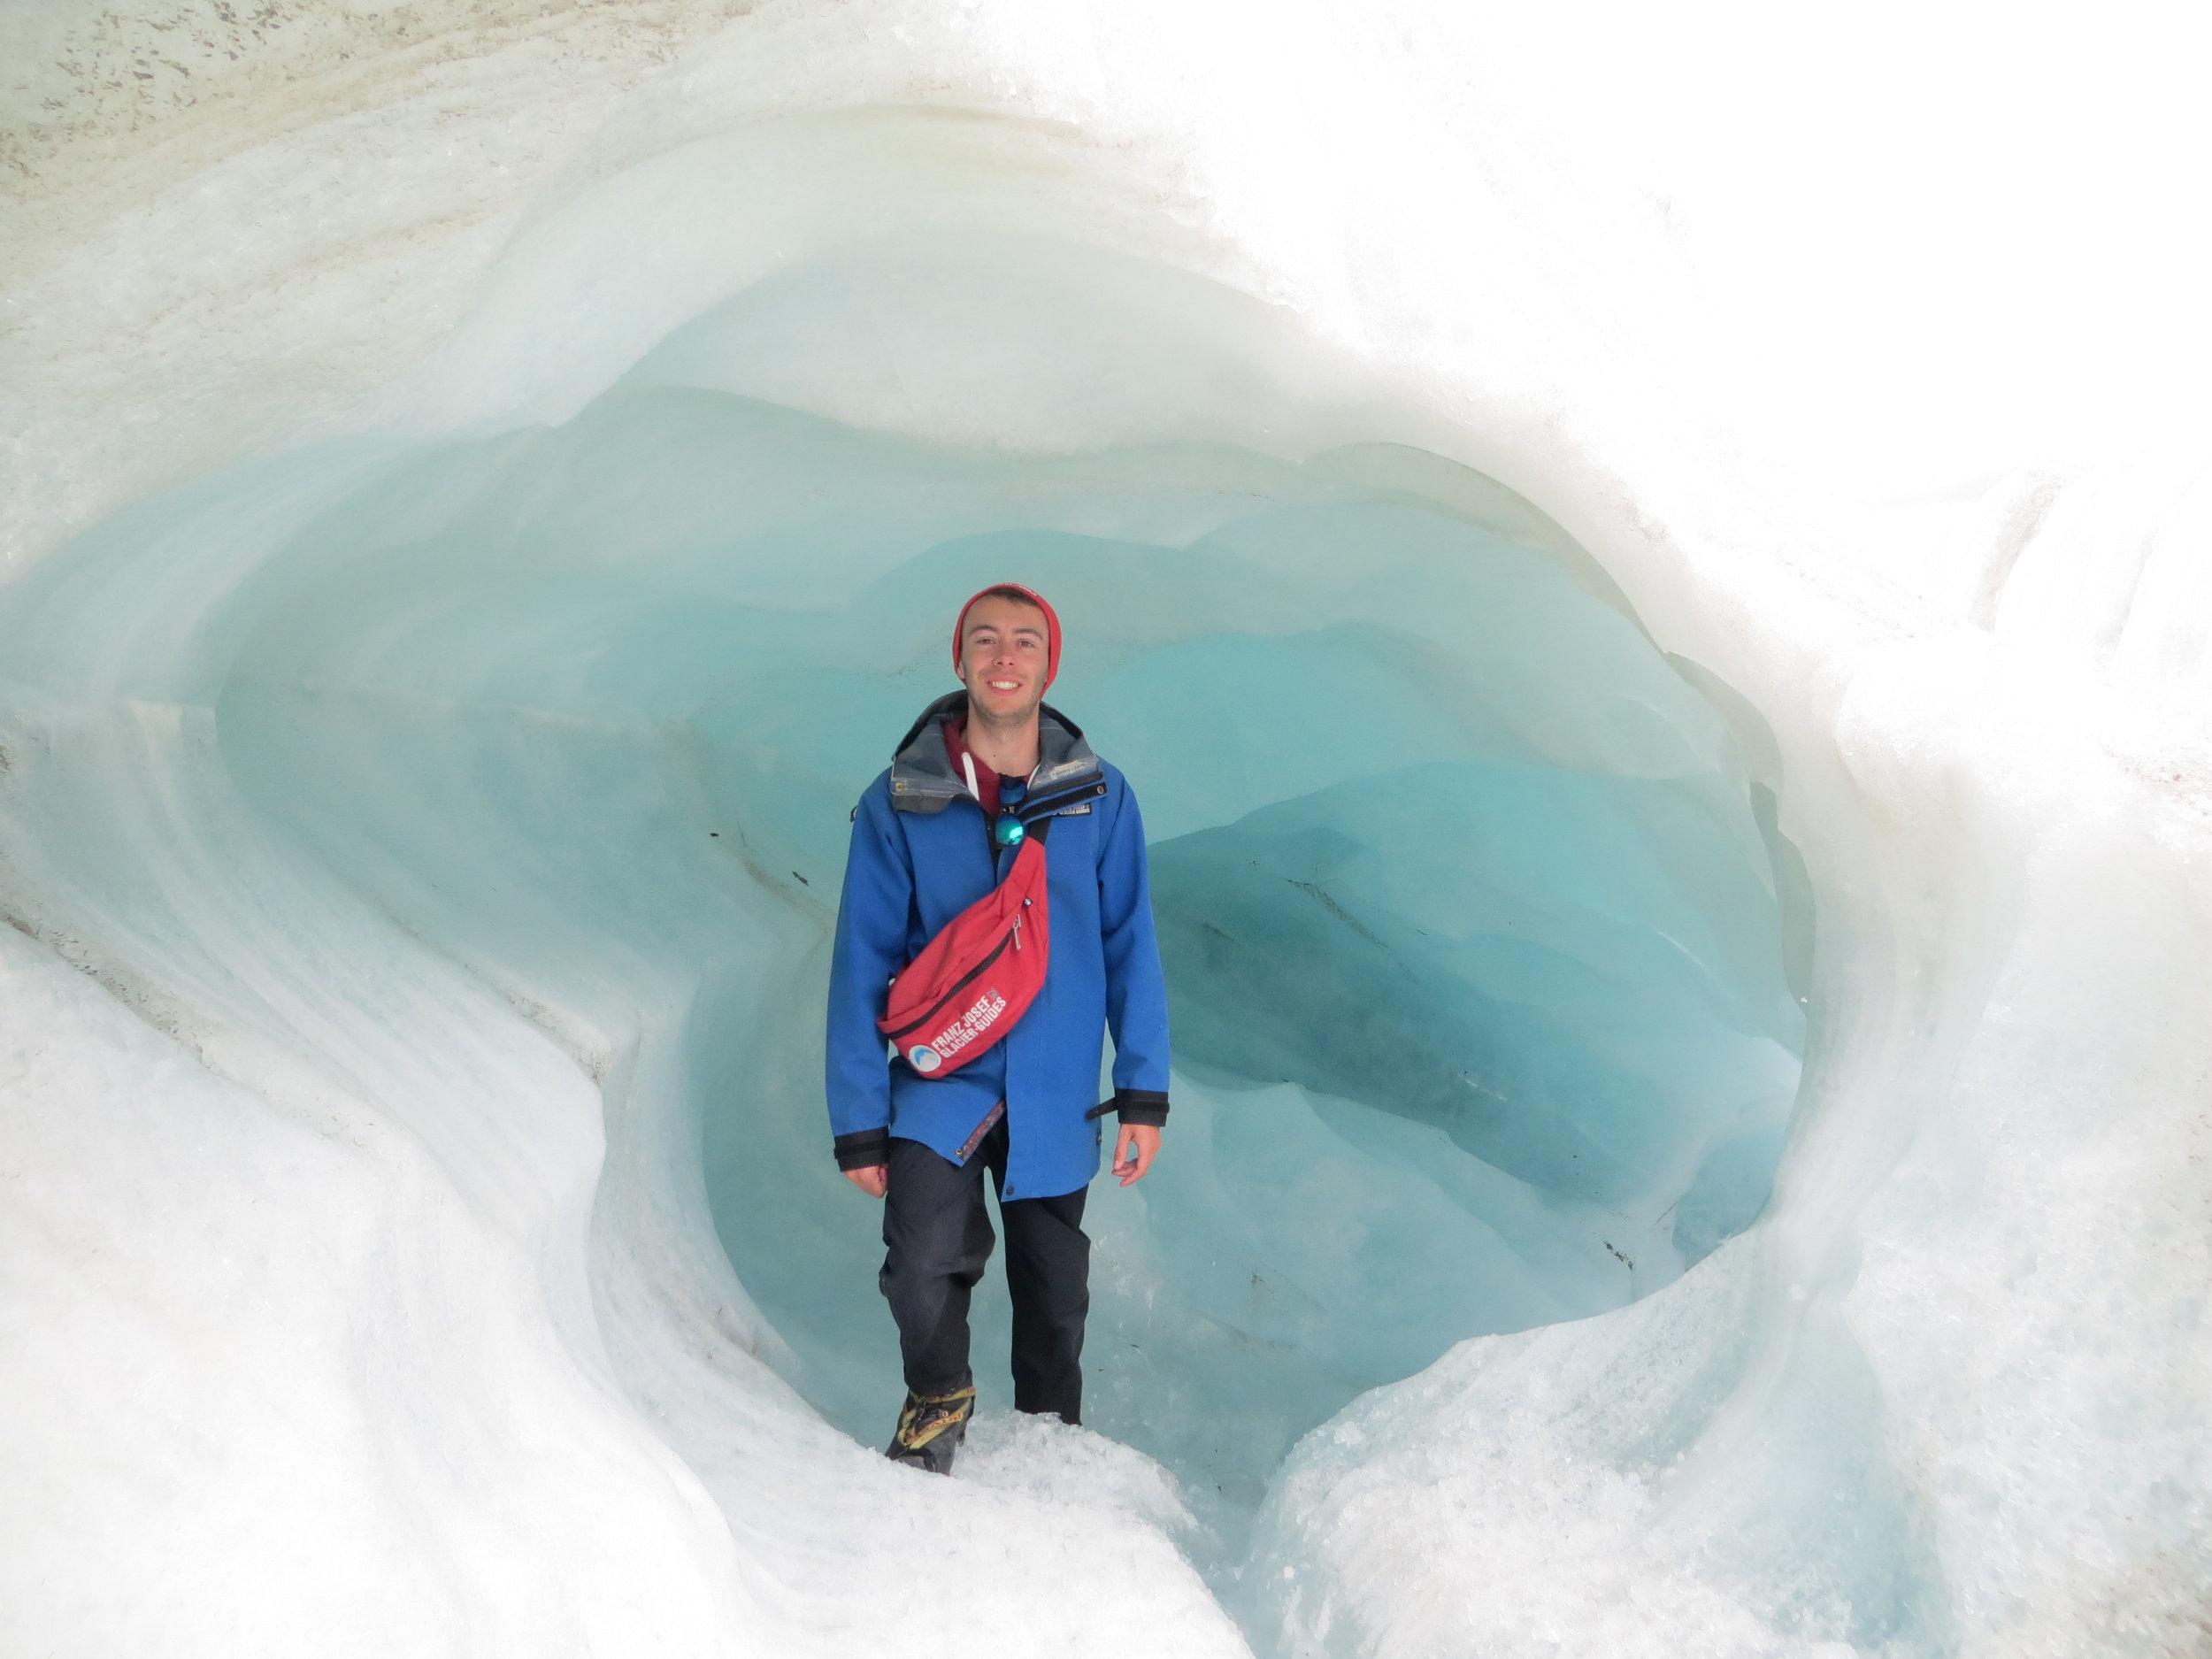 Exploring the glaciers of New Zealand